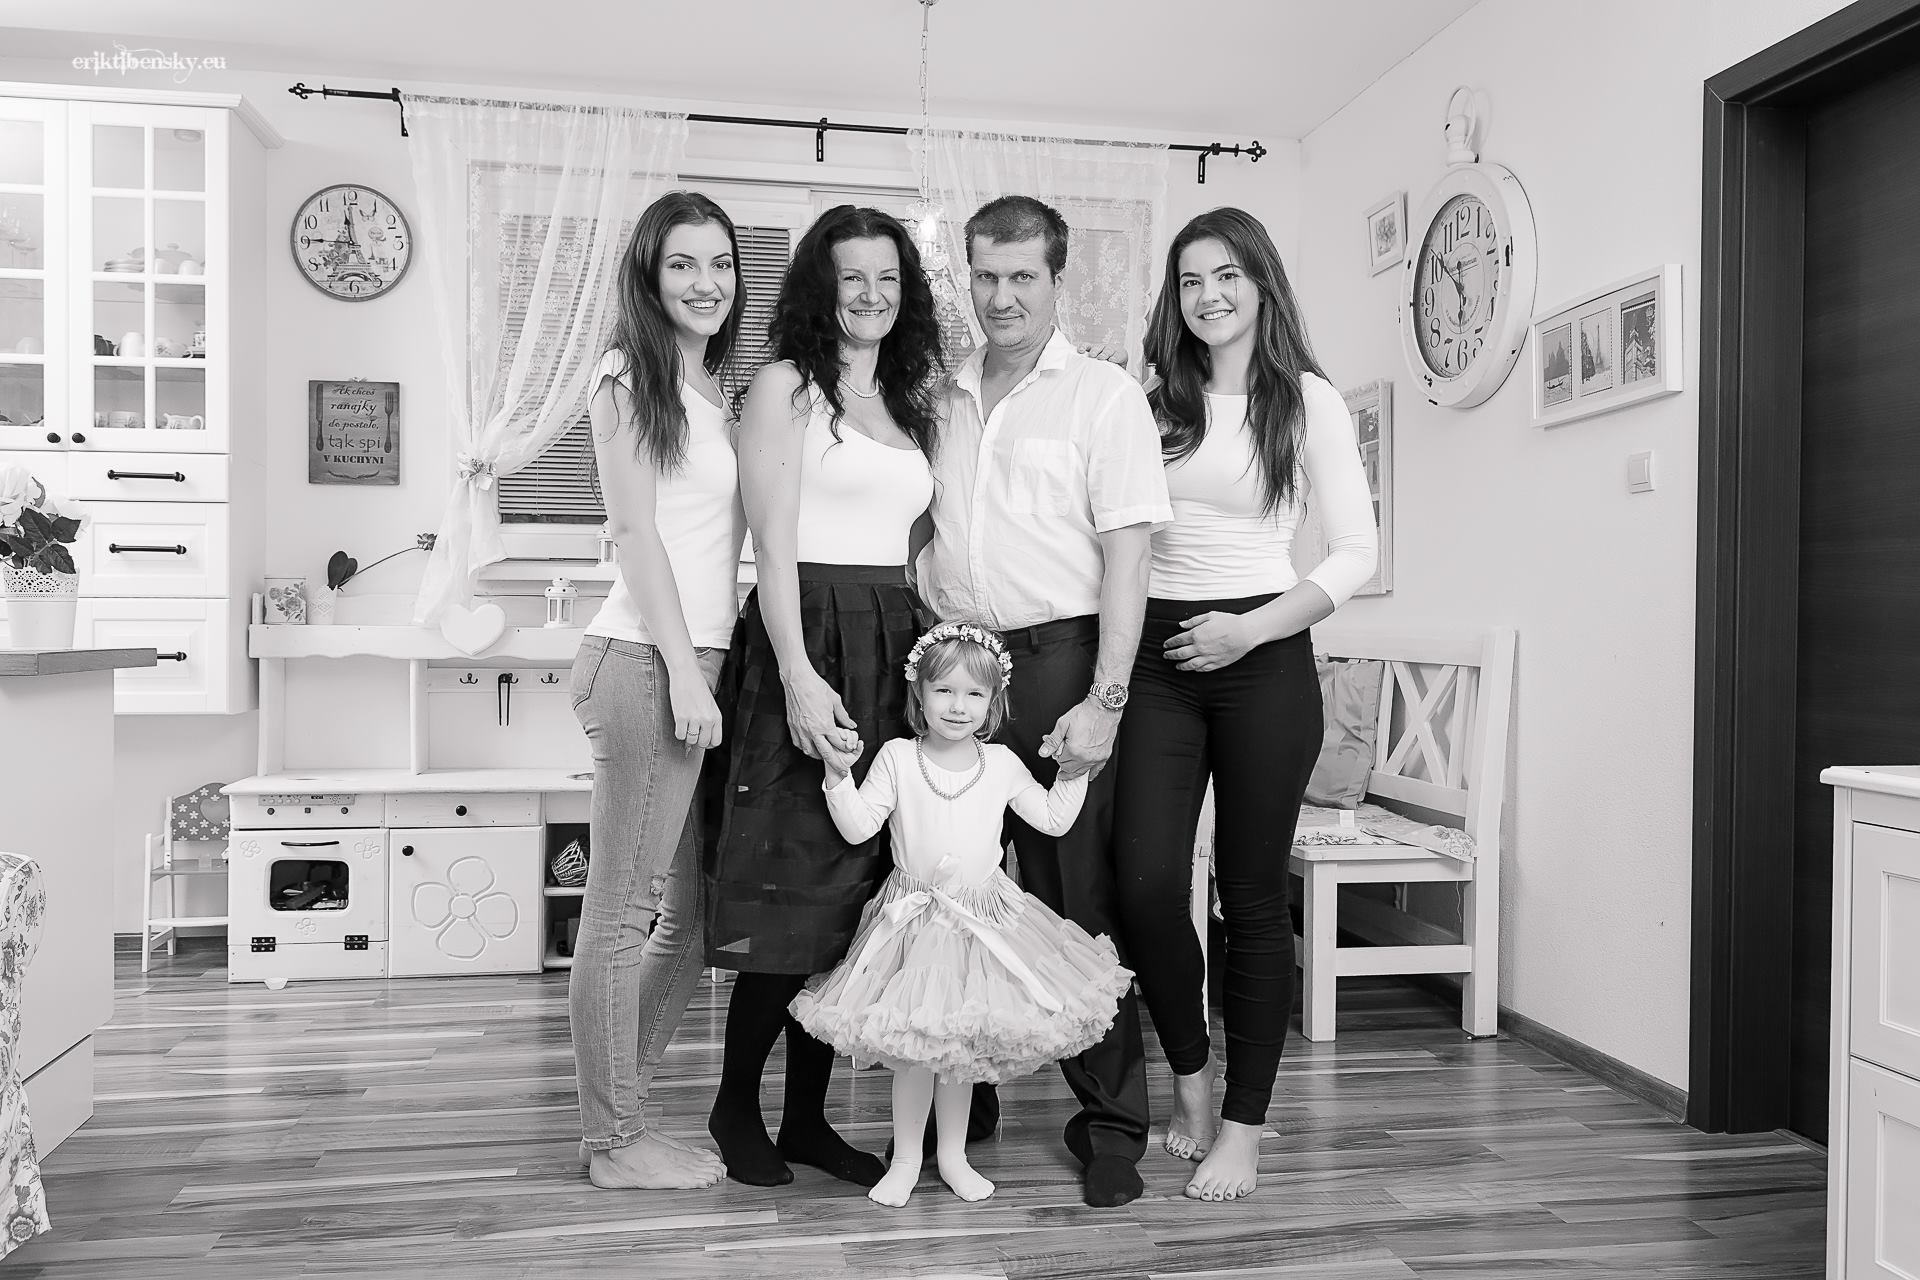 eriktibensky-eu-fotograf-home-photo-family-rodina-kids-deti-1022